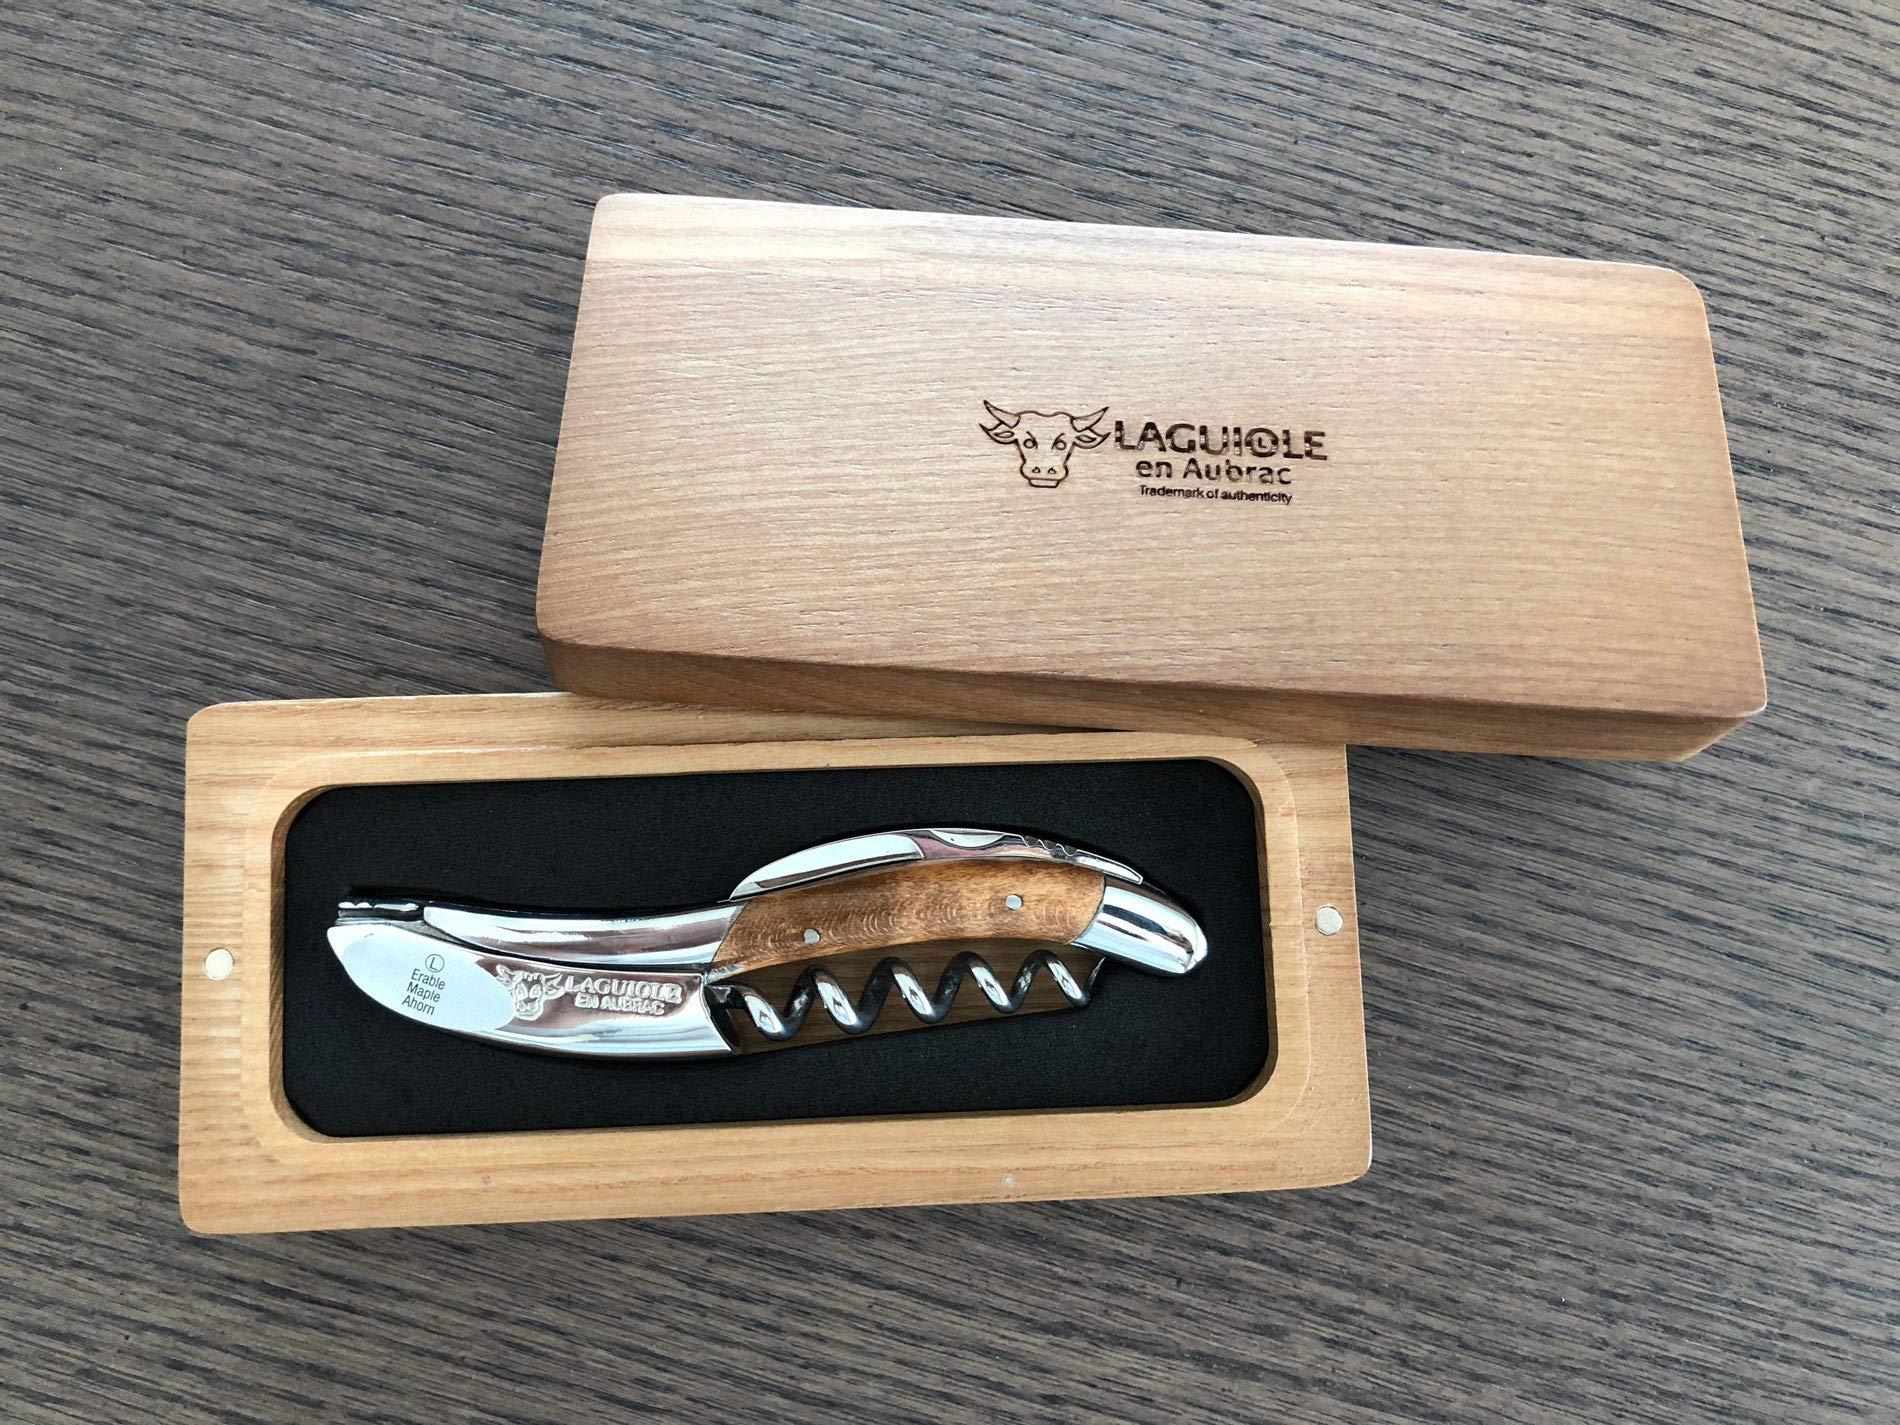 Laguiole en Aubrac Sommelier Corkscrew, Wavy Maple Wood